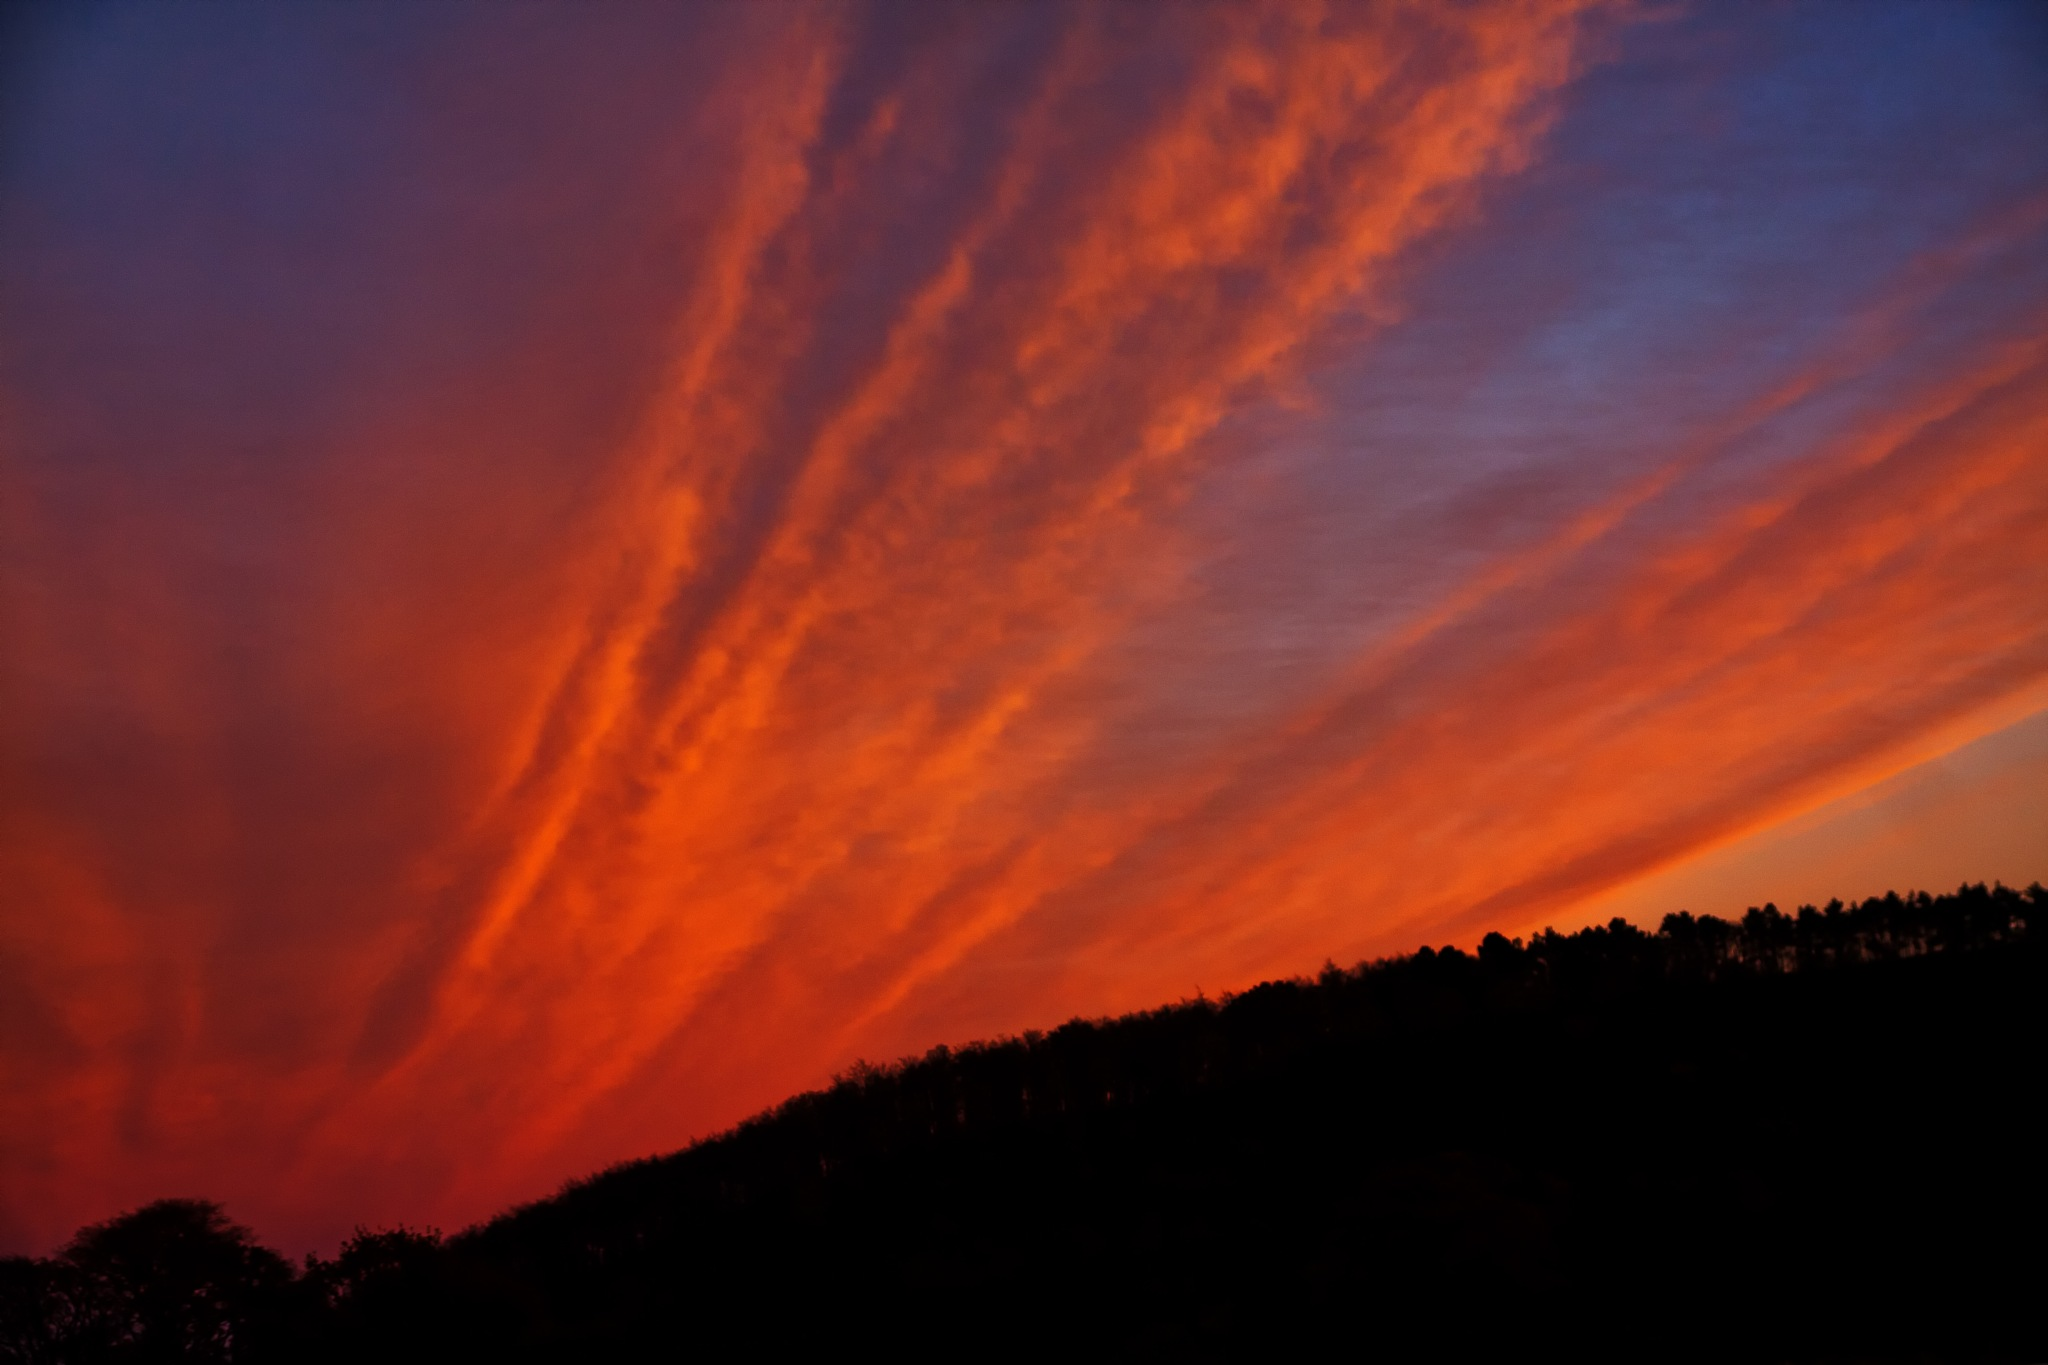 Sunset over North York Moors by martin.davis.5243817